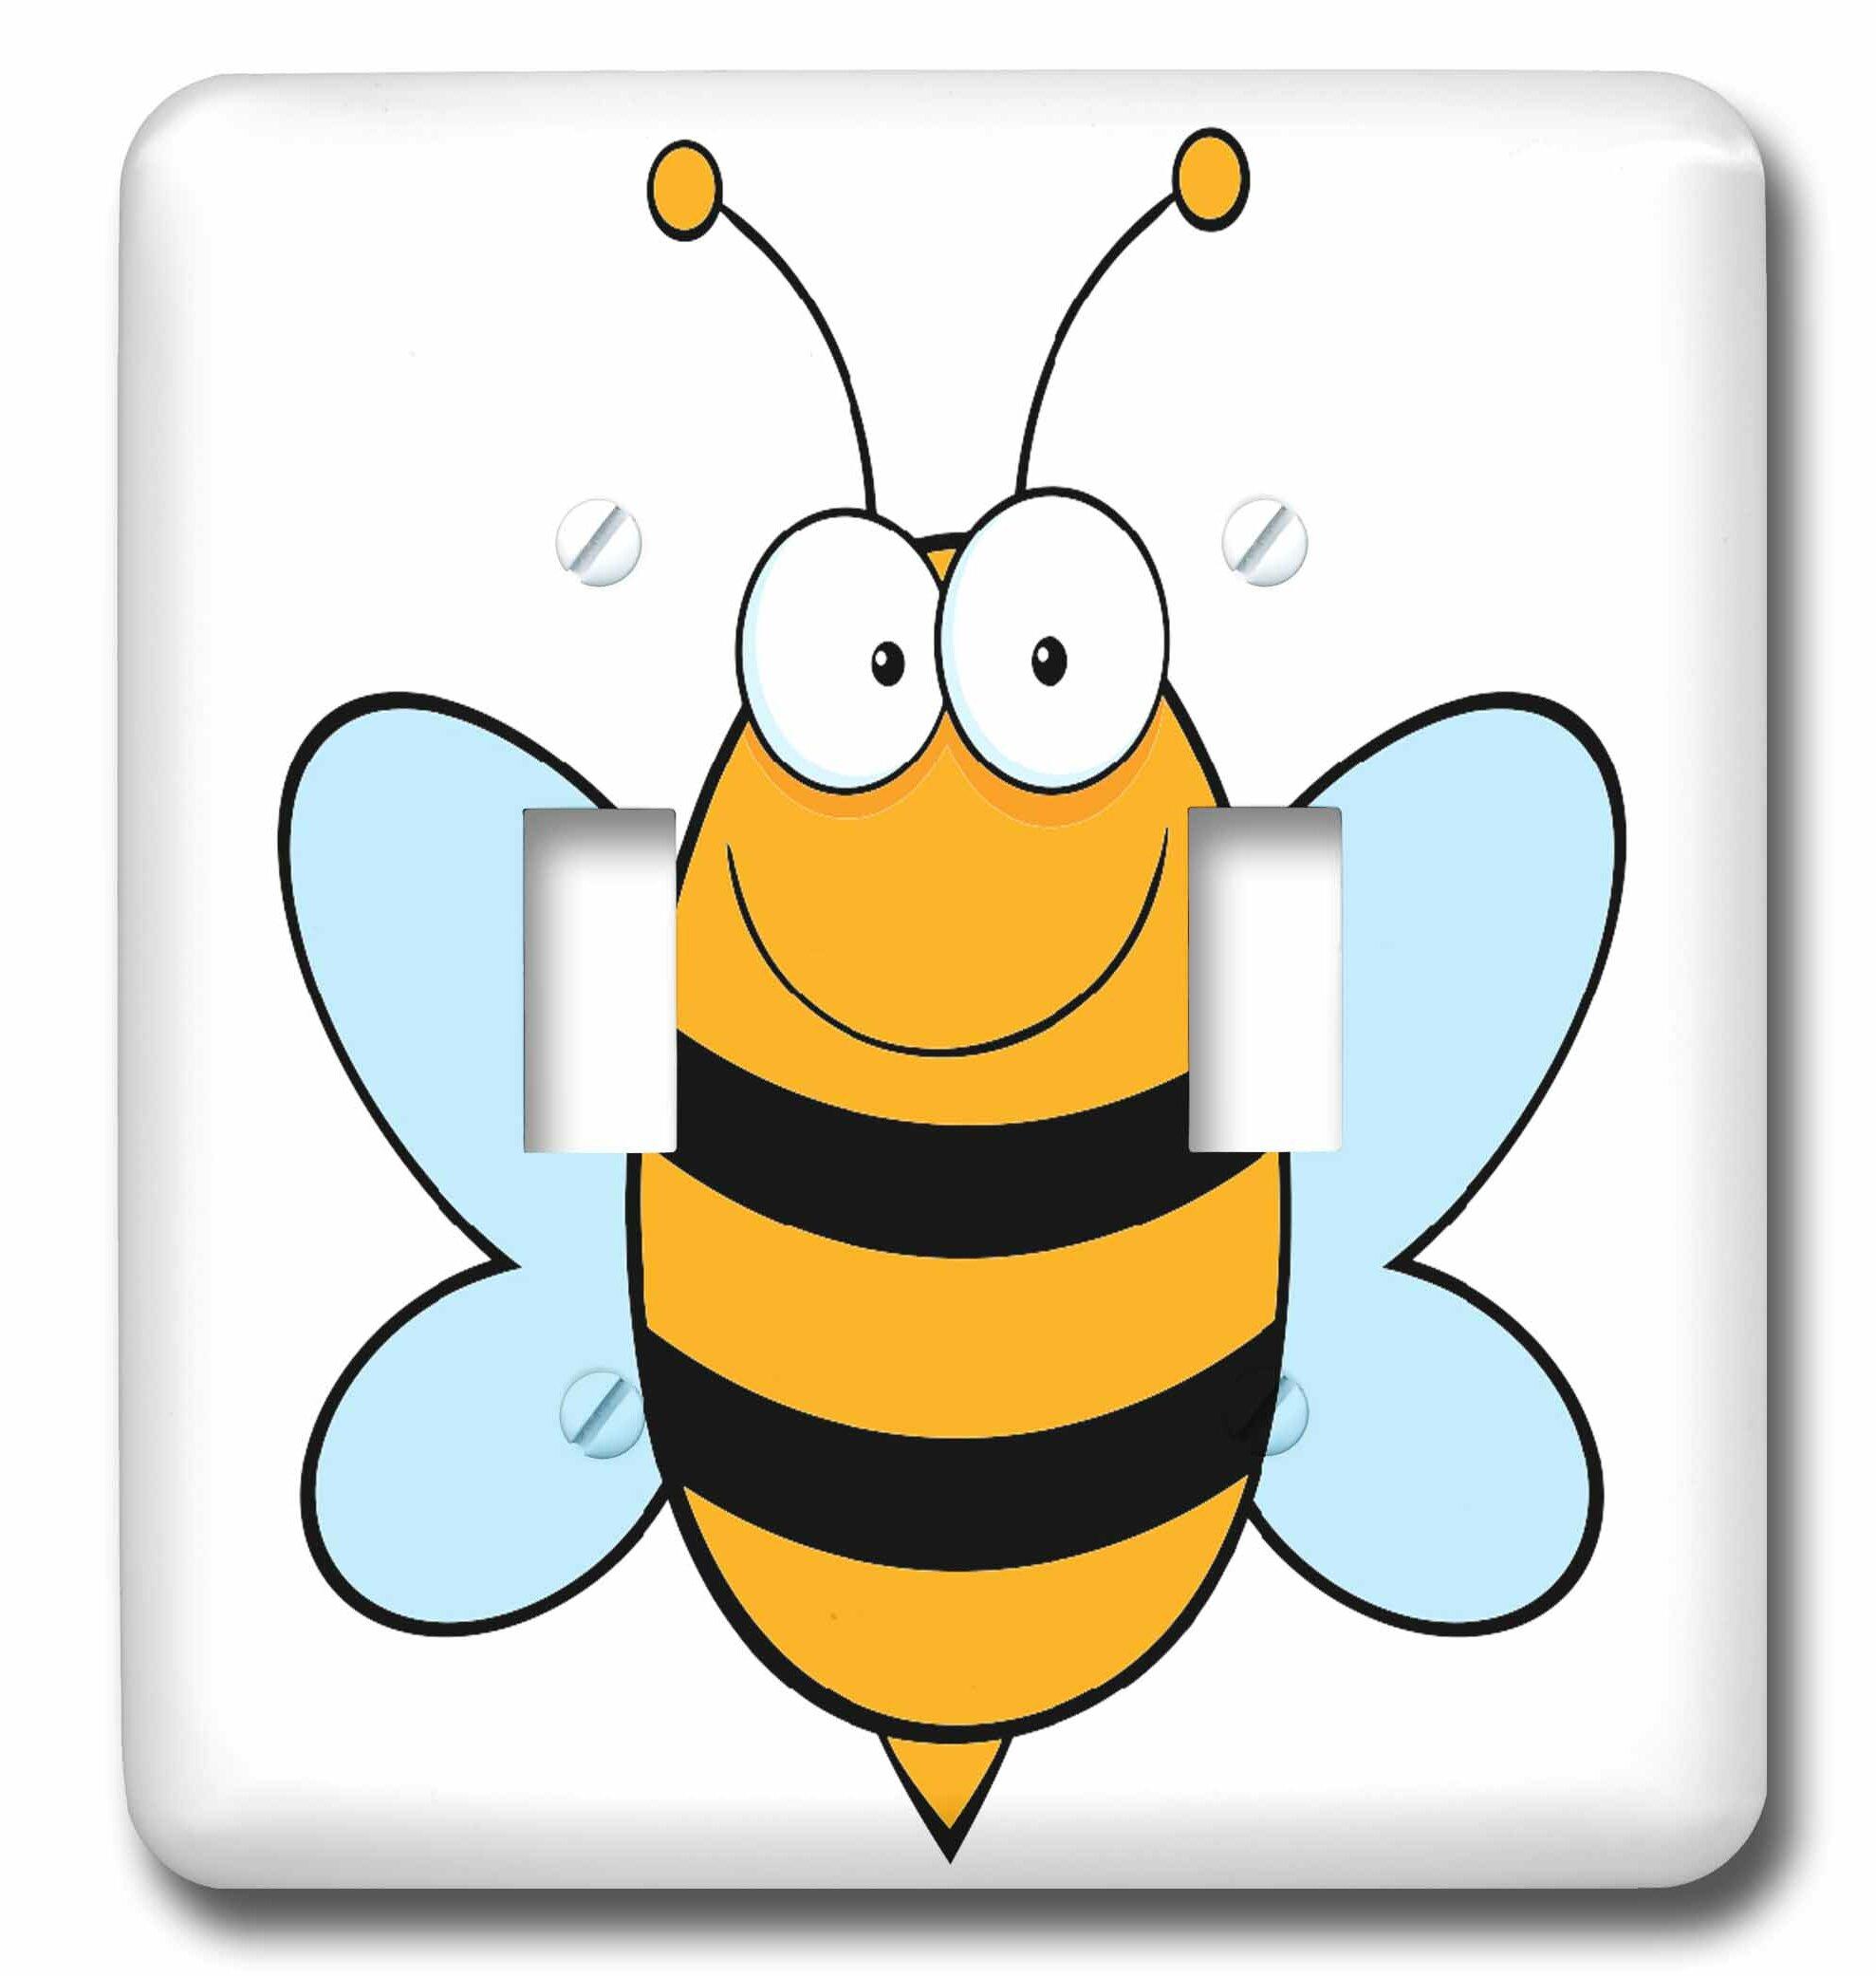 3drose Happy Bumble Bee Goofy Cartoon 2 Gang Toggle Light Switch Wall Plate Wayfair